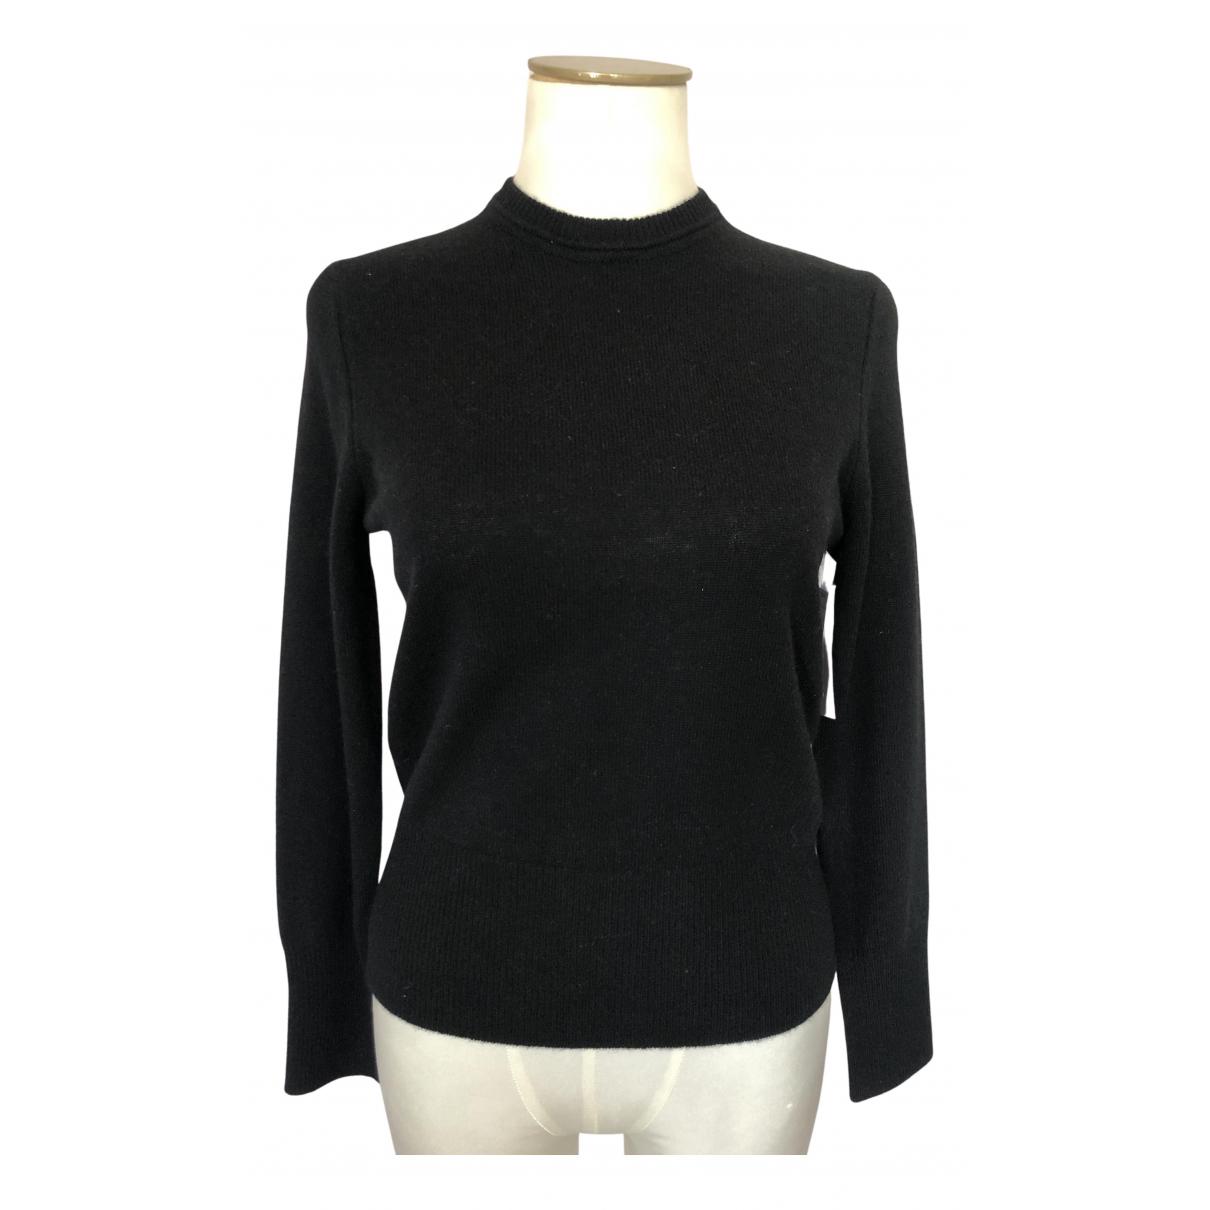 Equipment N Black Cashmere Knitwear for Women XS International